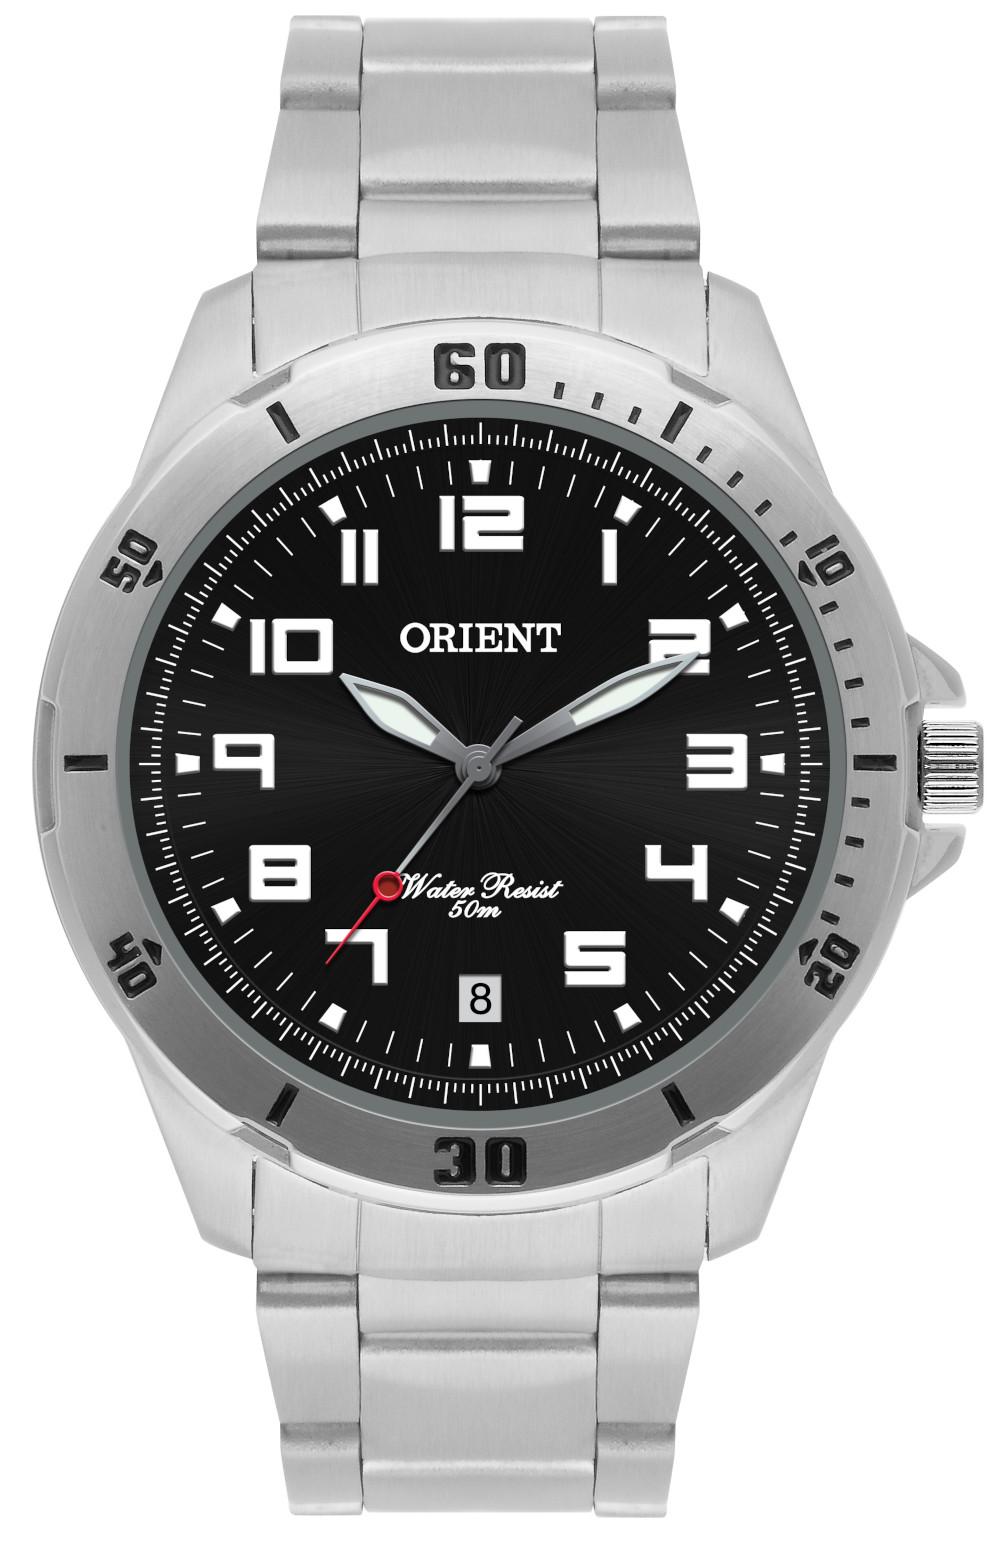 Relógio Orient MBSS1155A